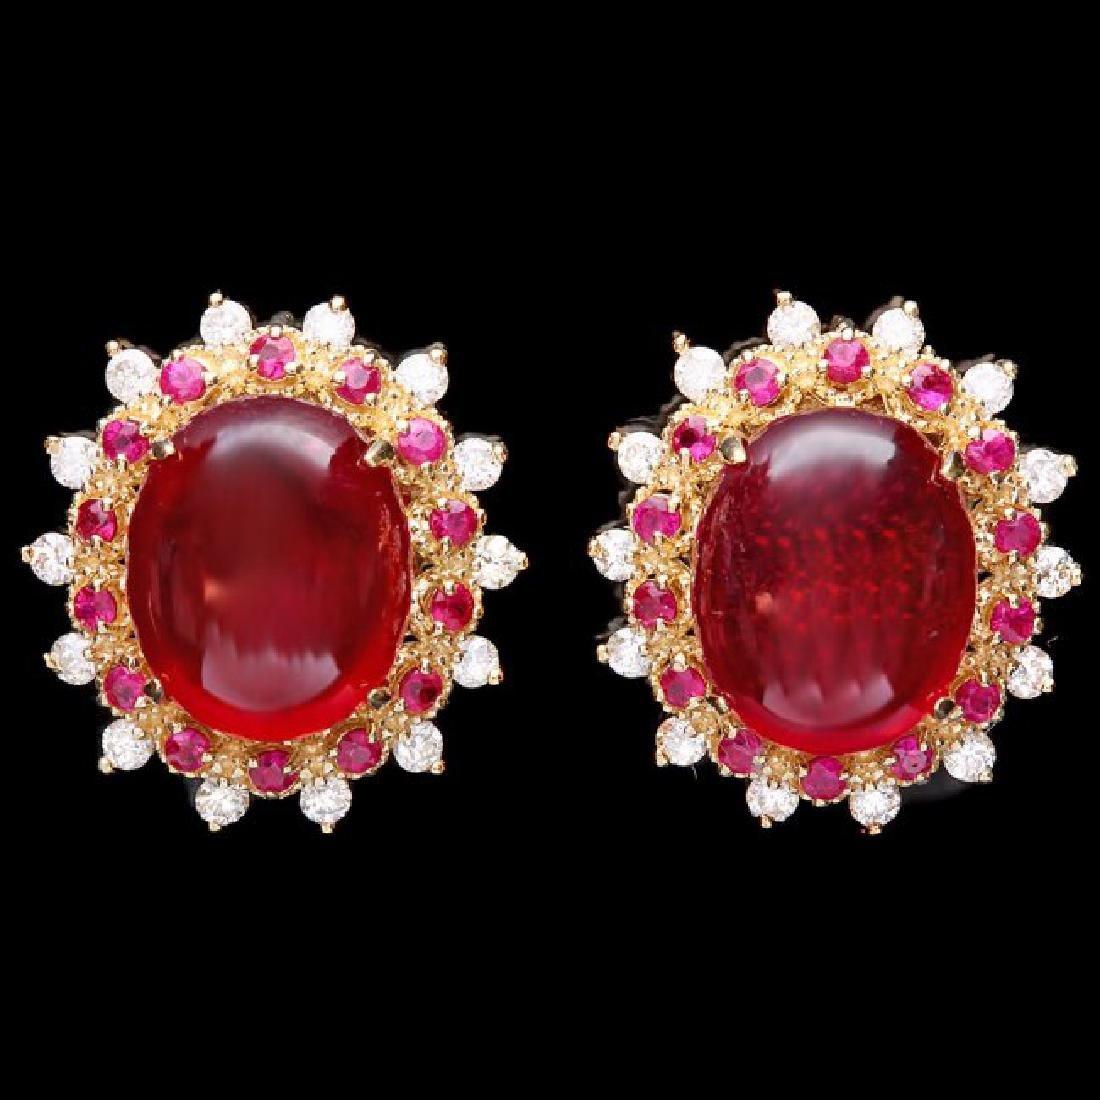 14k Gold 17.5ct Ruby 0.80ct Diamond Earrings